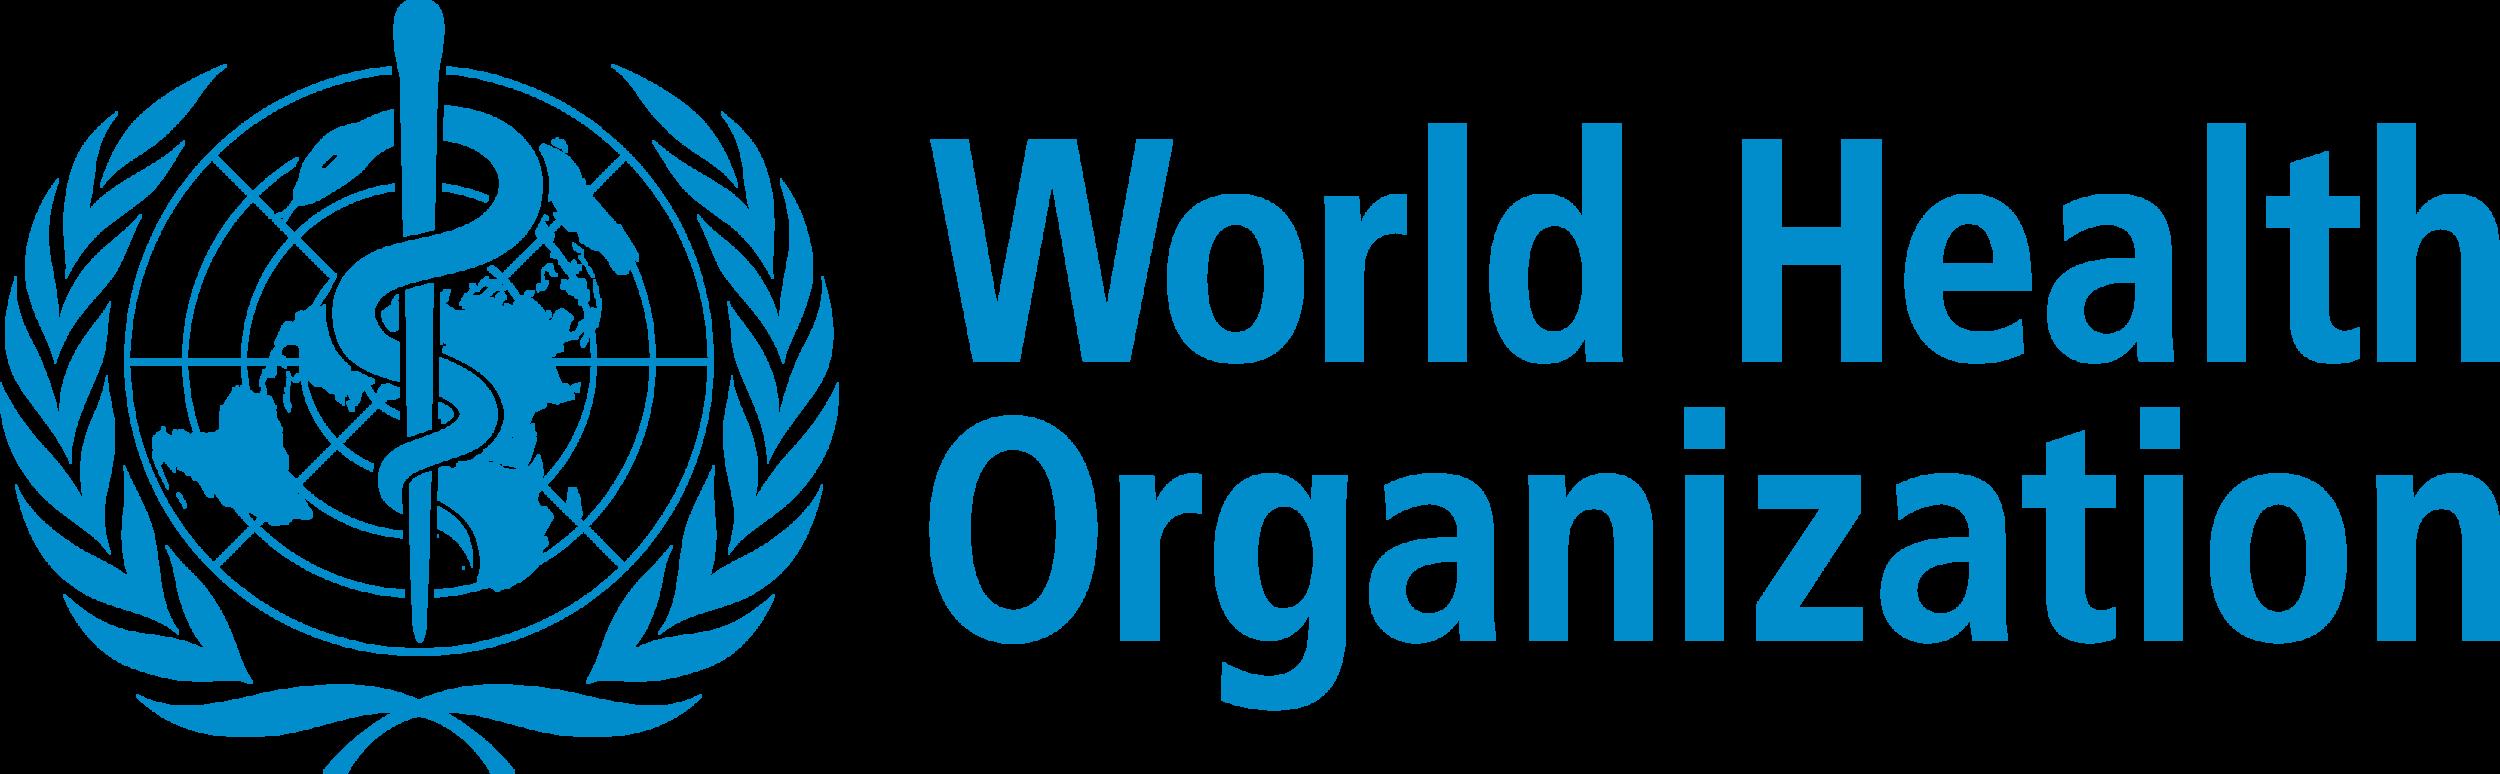 who-logo-world-health-organization-logo.png